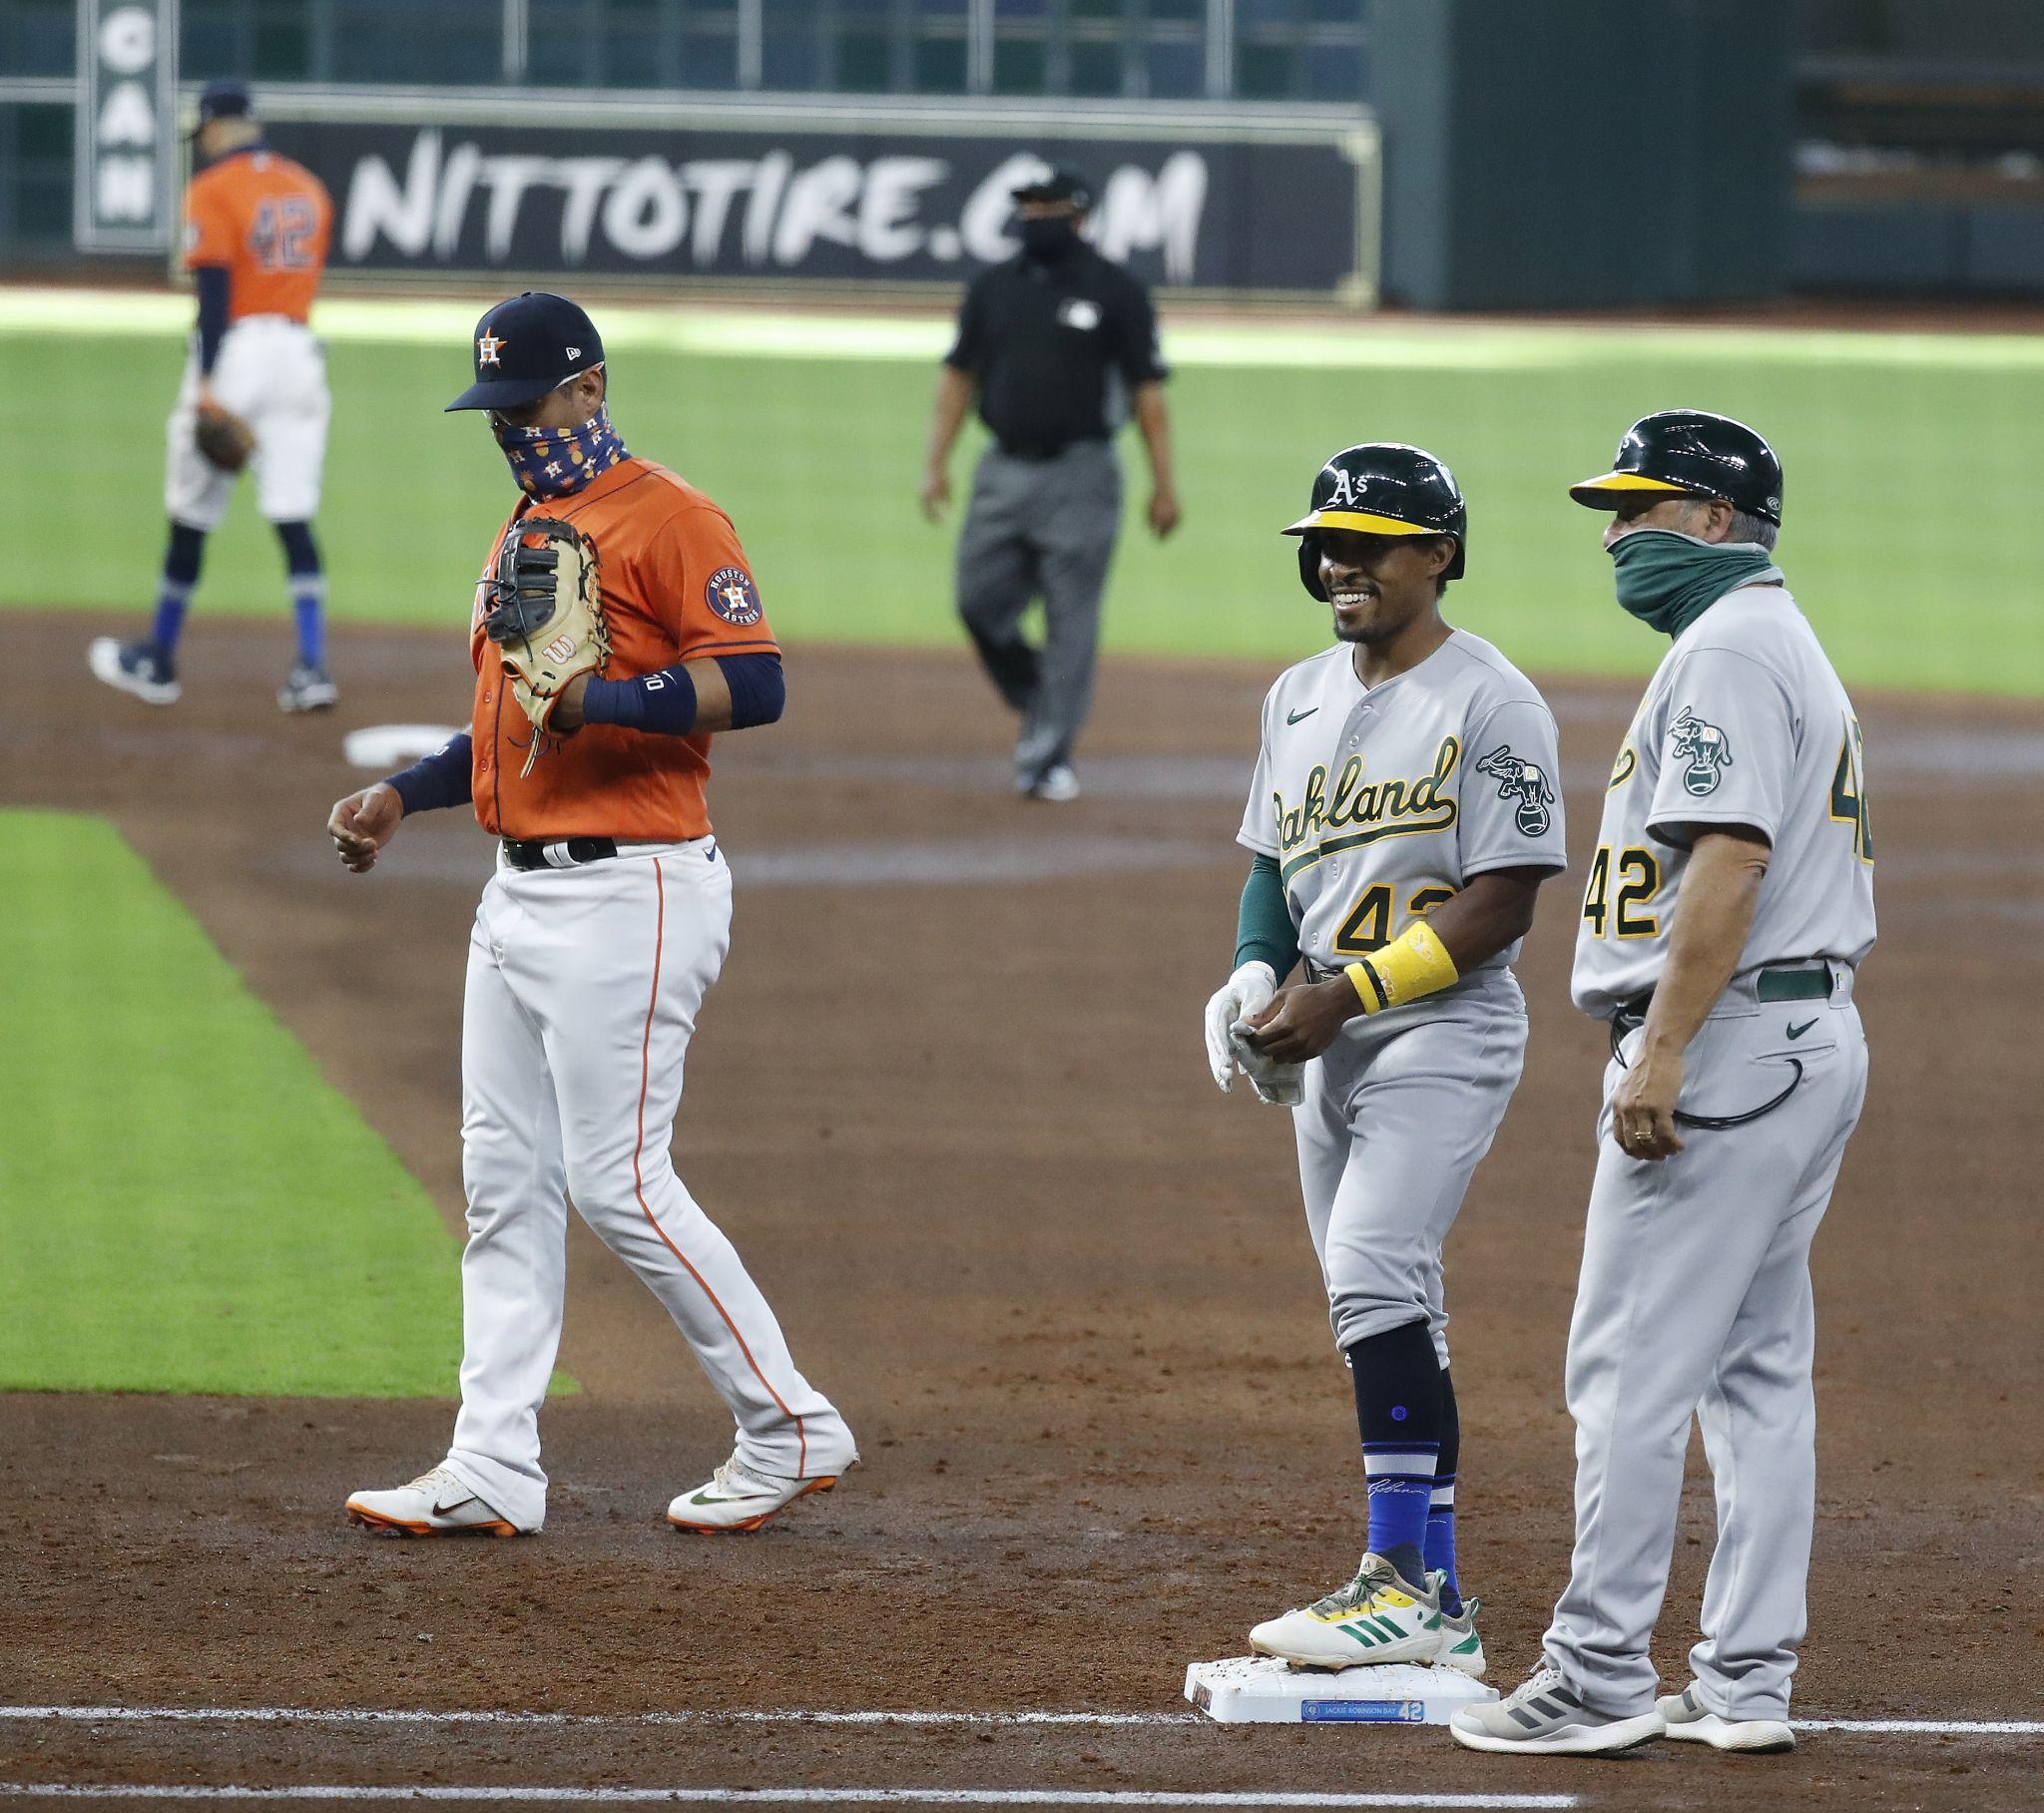 Game times set for Astros-Athletics series - Houston Chronicle